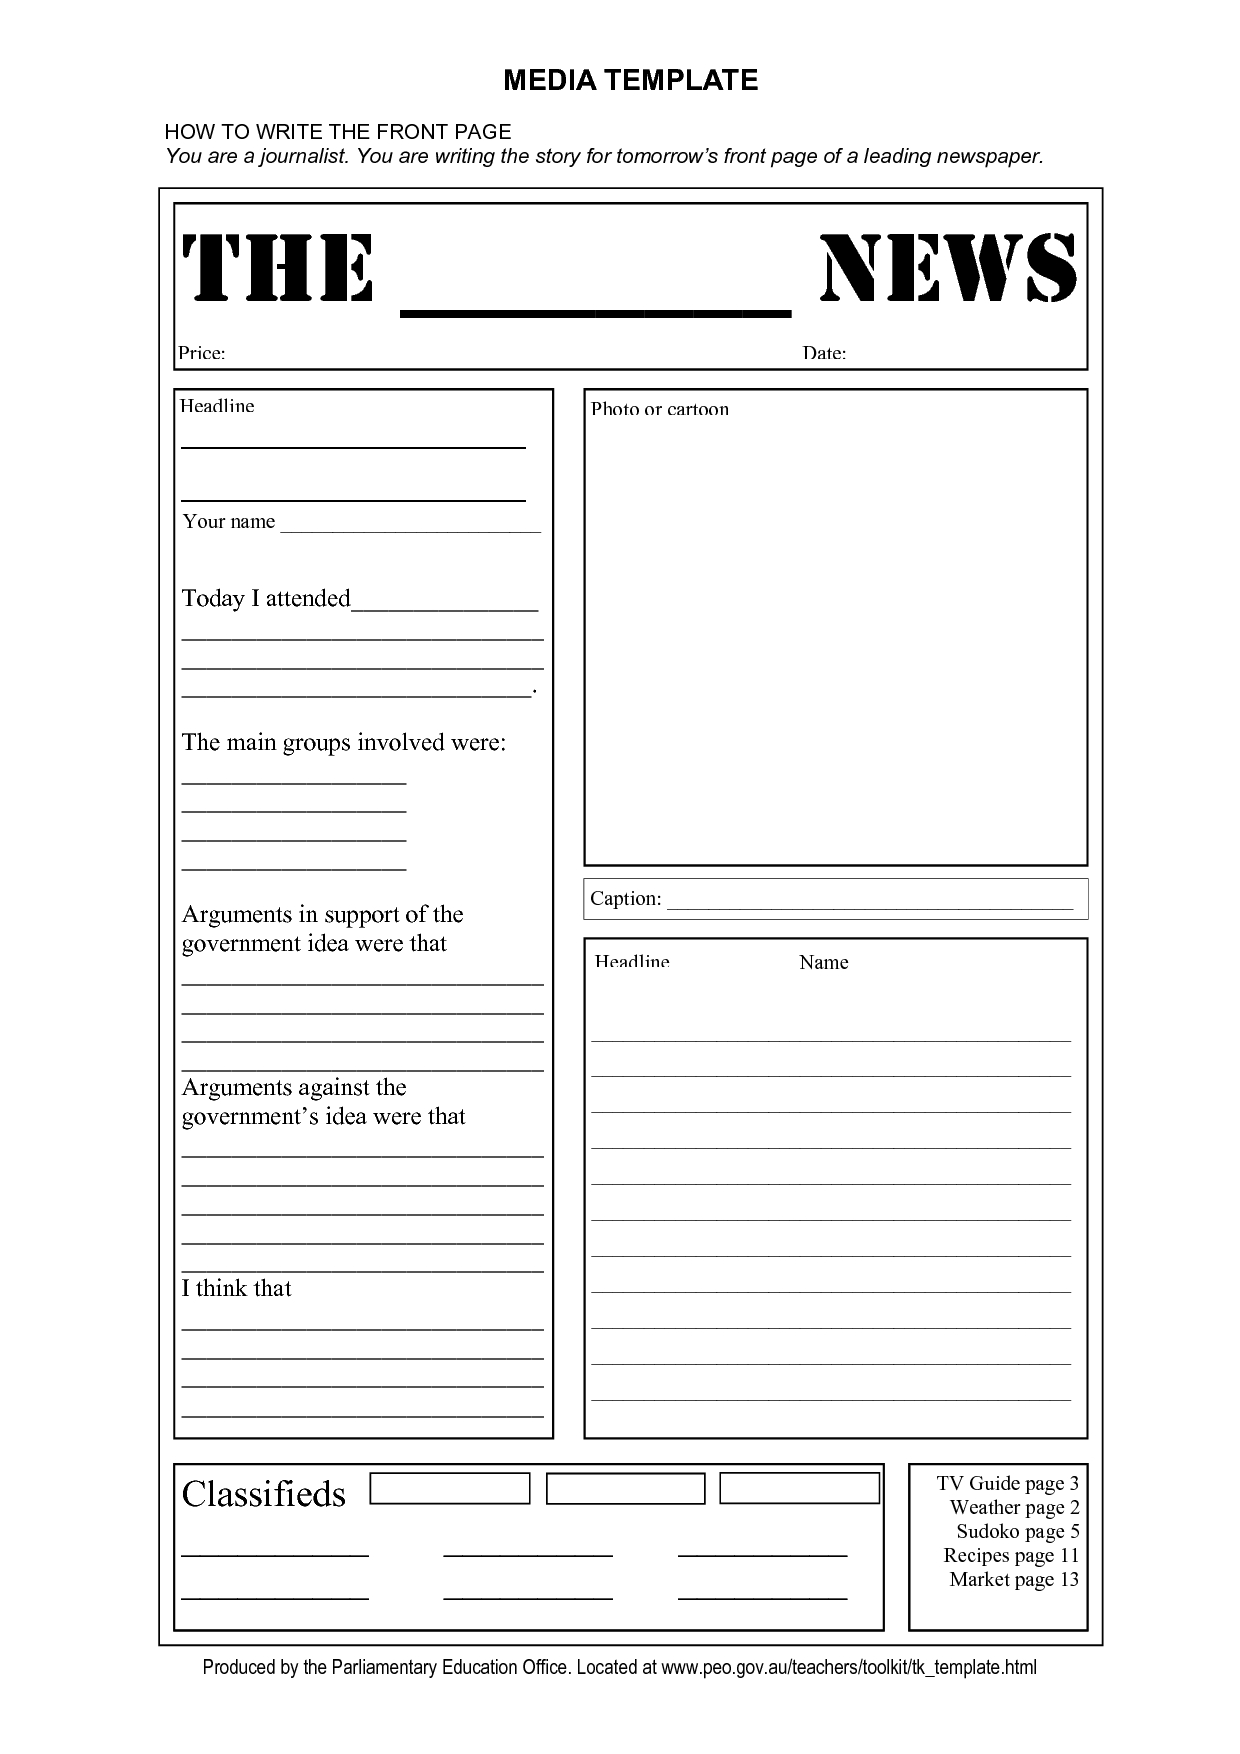 Blank Newspaper Template | E Commercewordpress Inside Blank Newspaper Template For Word